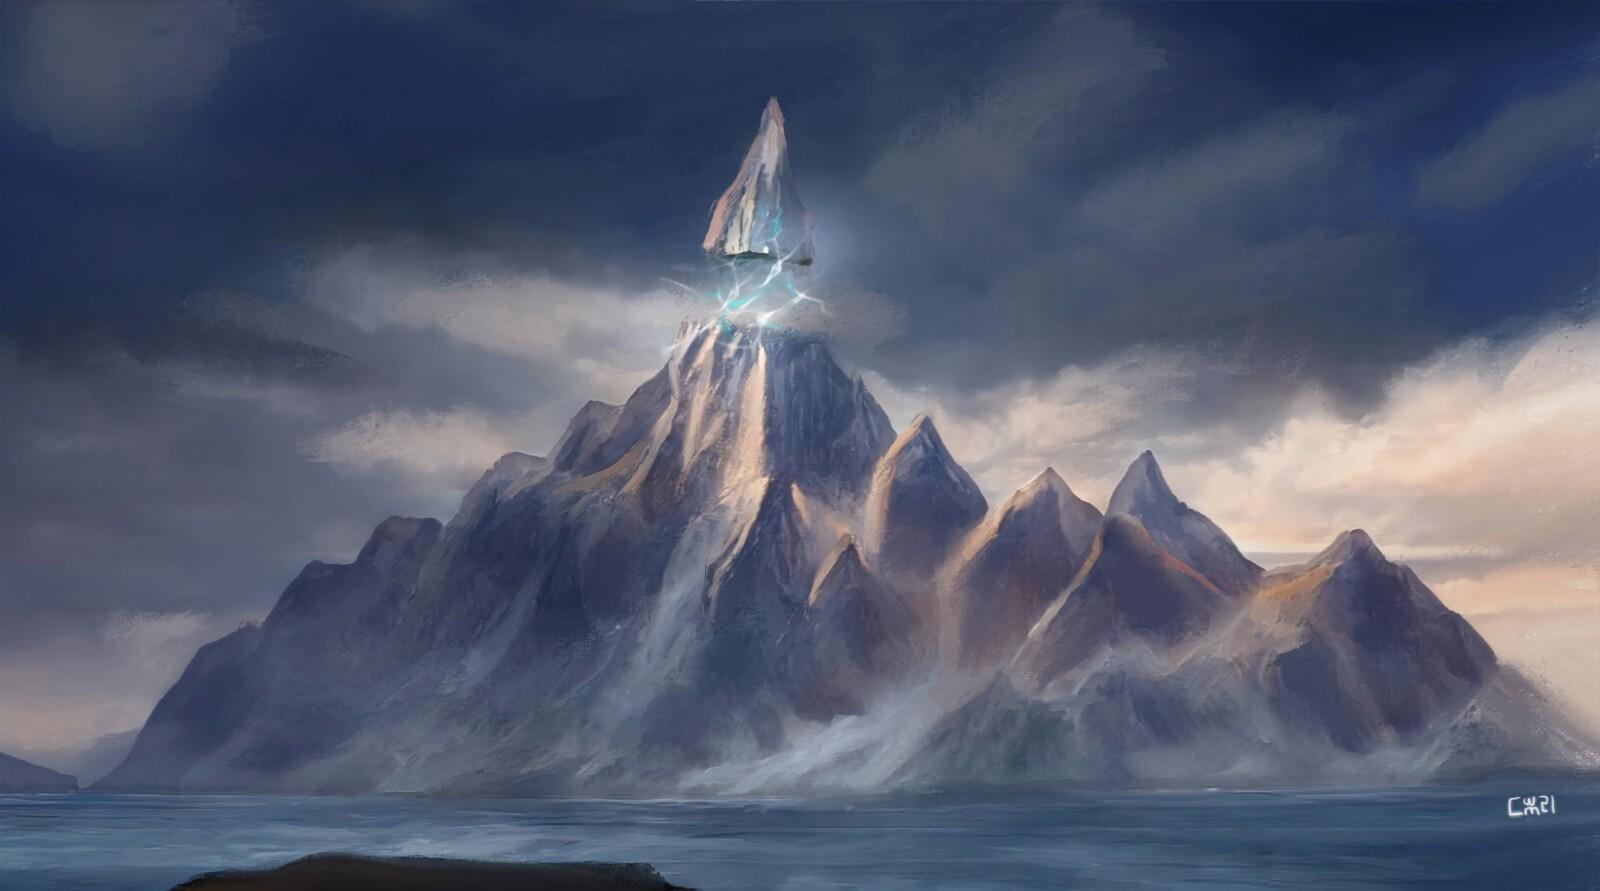 The Electric Peak